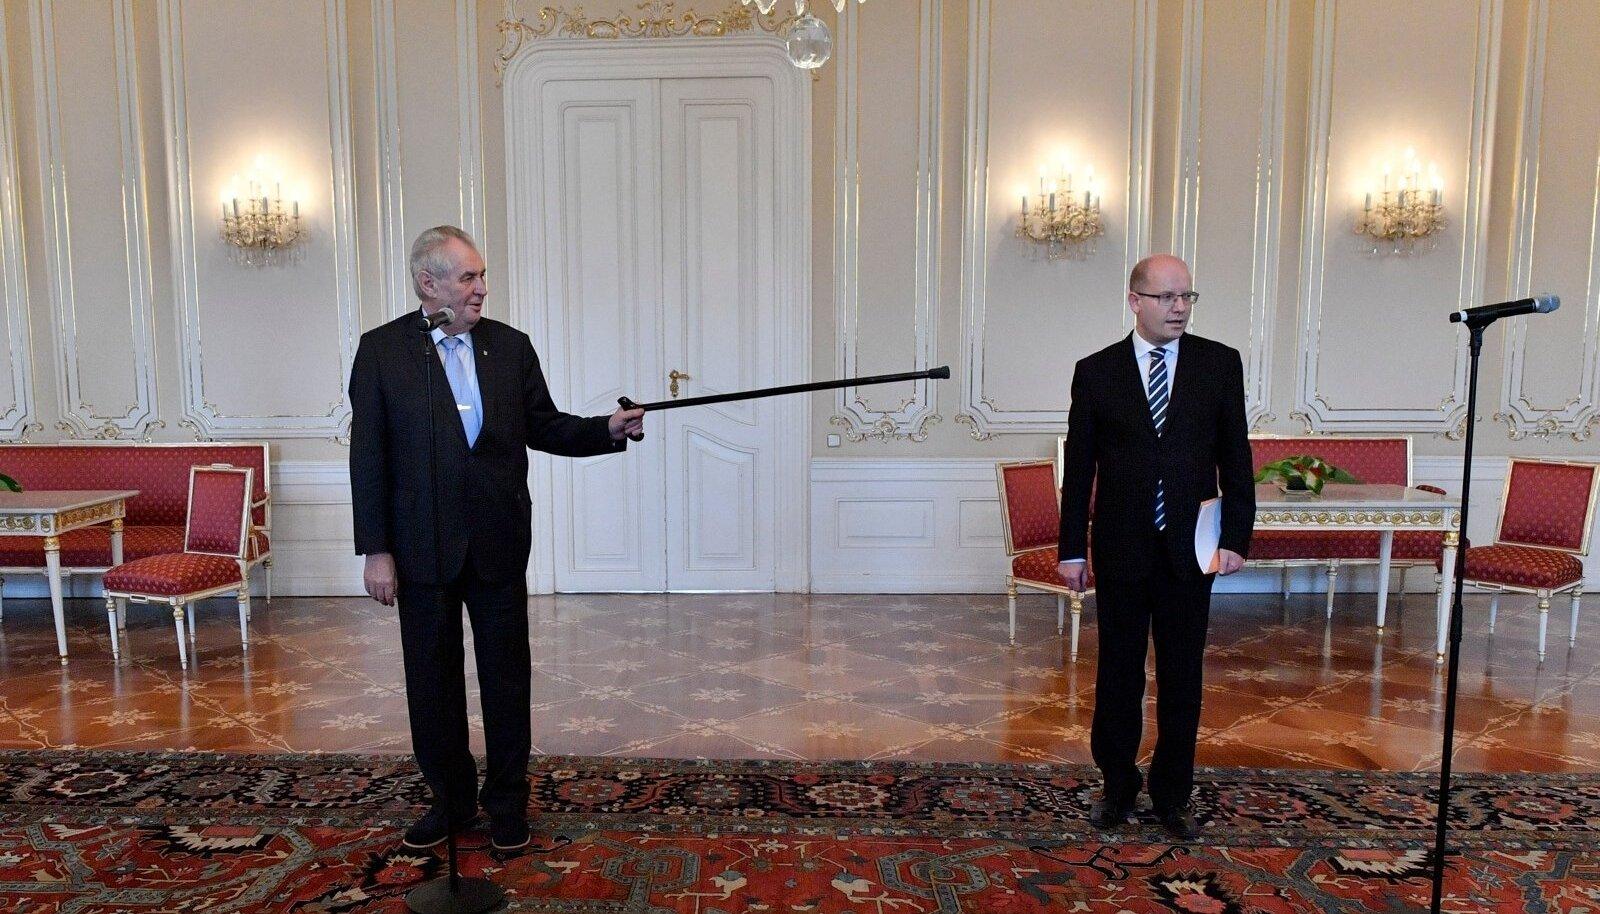 Miloš Zeman ja Bohuslav Sobotka